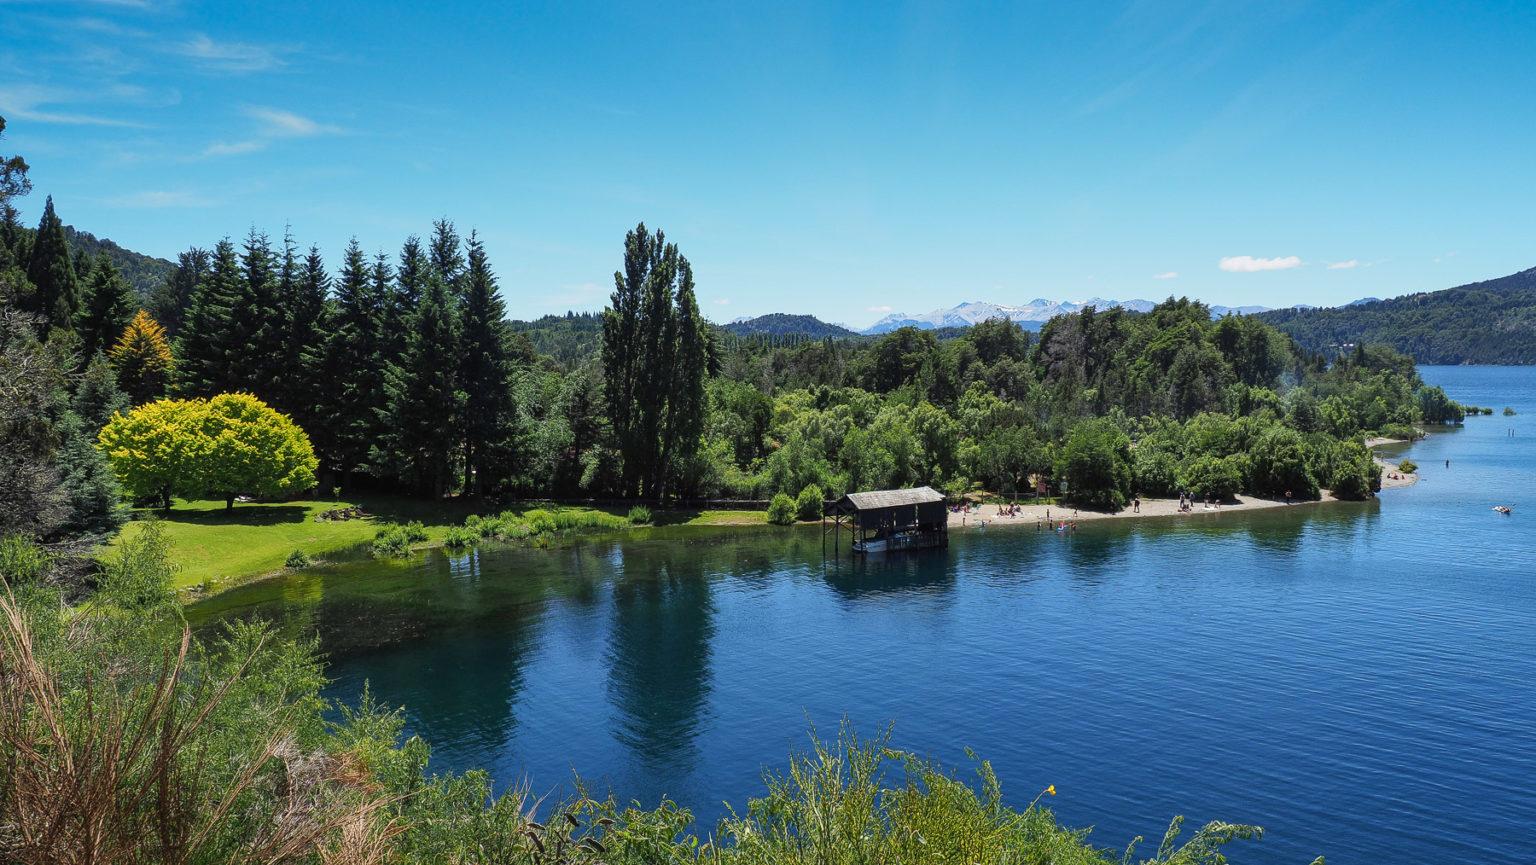 Colonia Suiza am Lago Nahuel Huapi, hier kann man's aushalten